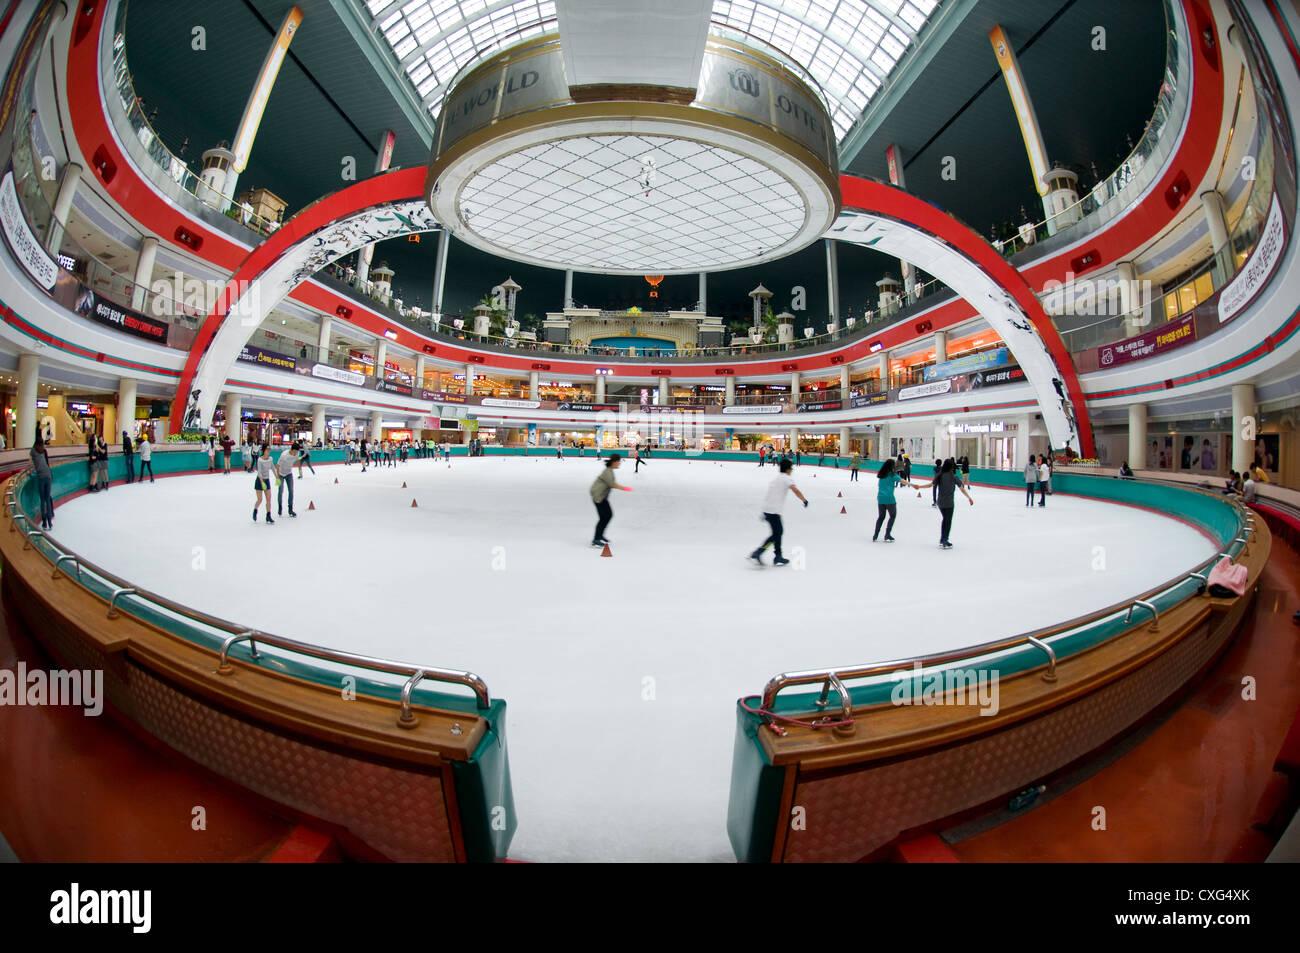 Roller skating rink jakarta - Lotto World Indoor Ice Skating Rink Seoul Korea Stock Image